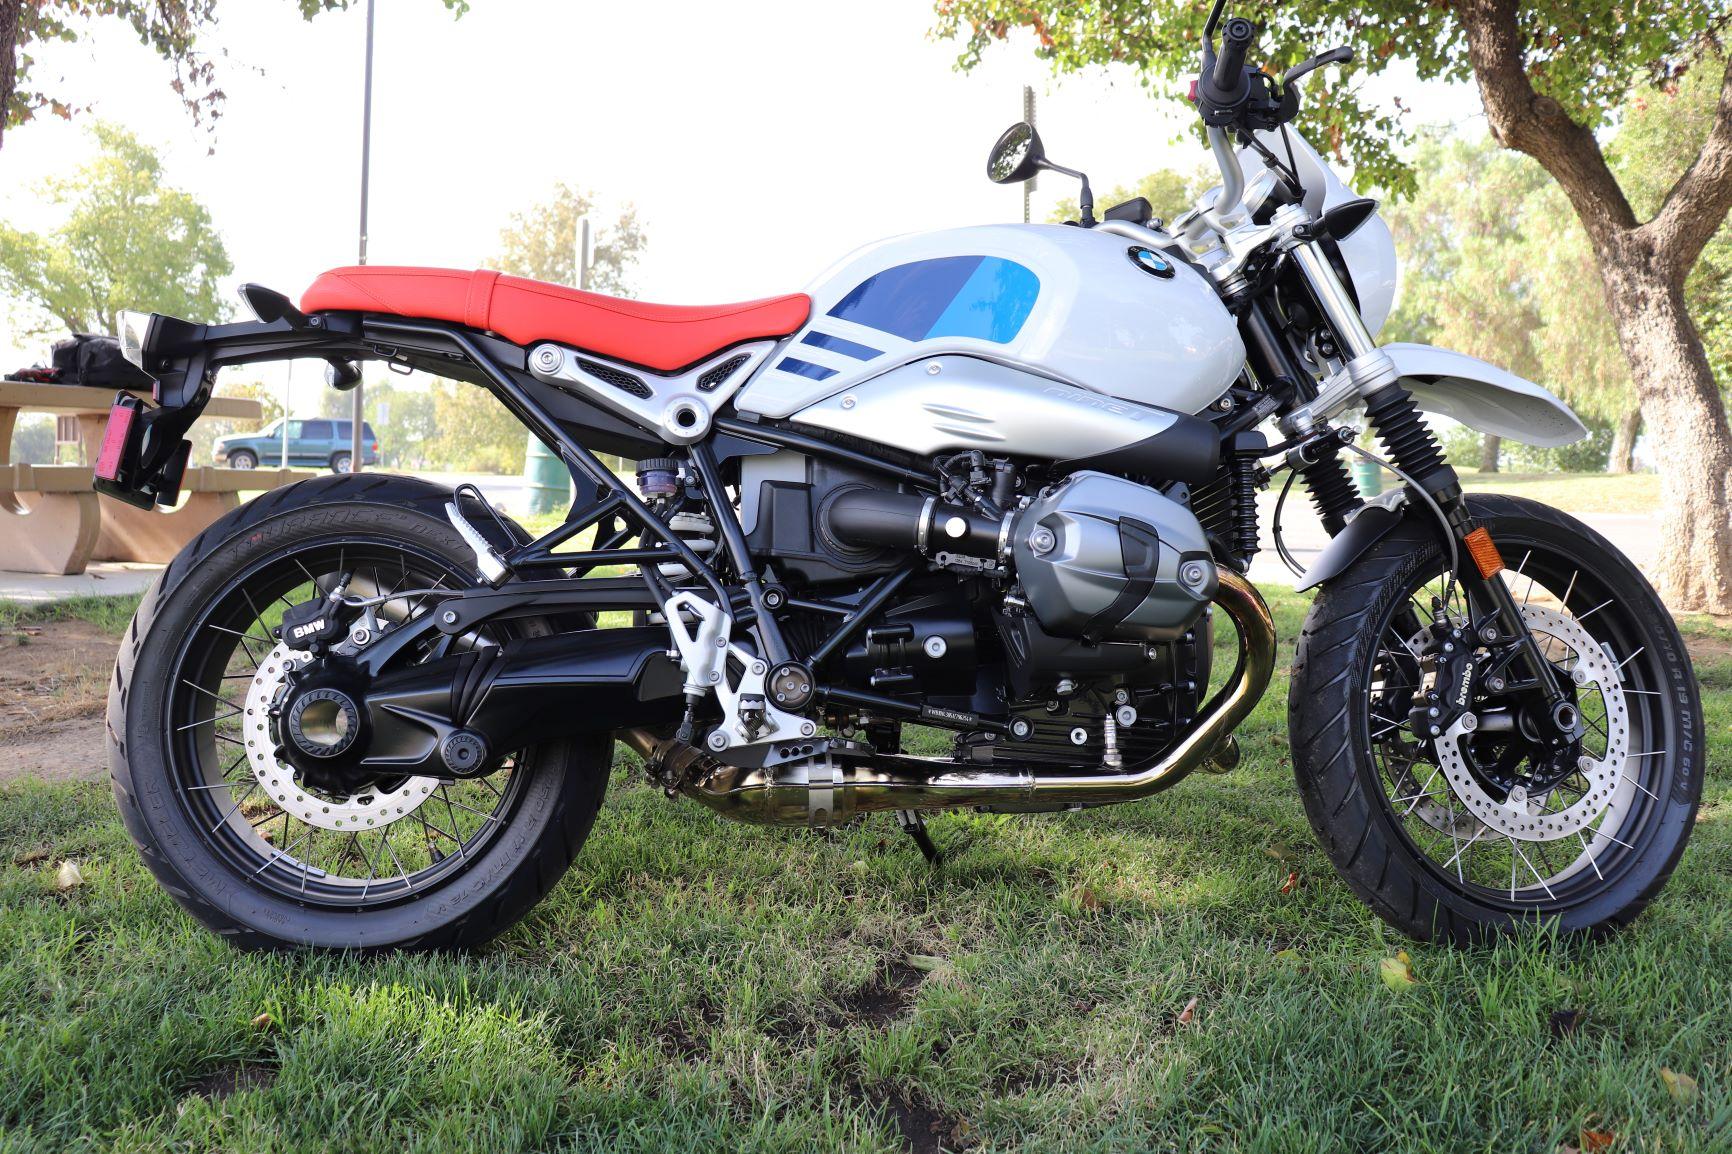 2017 BMW R9T Urban GS, bmw motorcycle, albesadv, albe's adv, r9t, urban gs